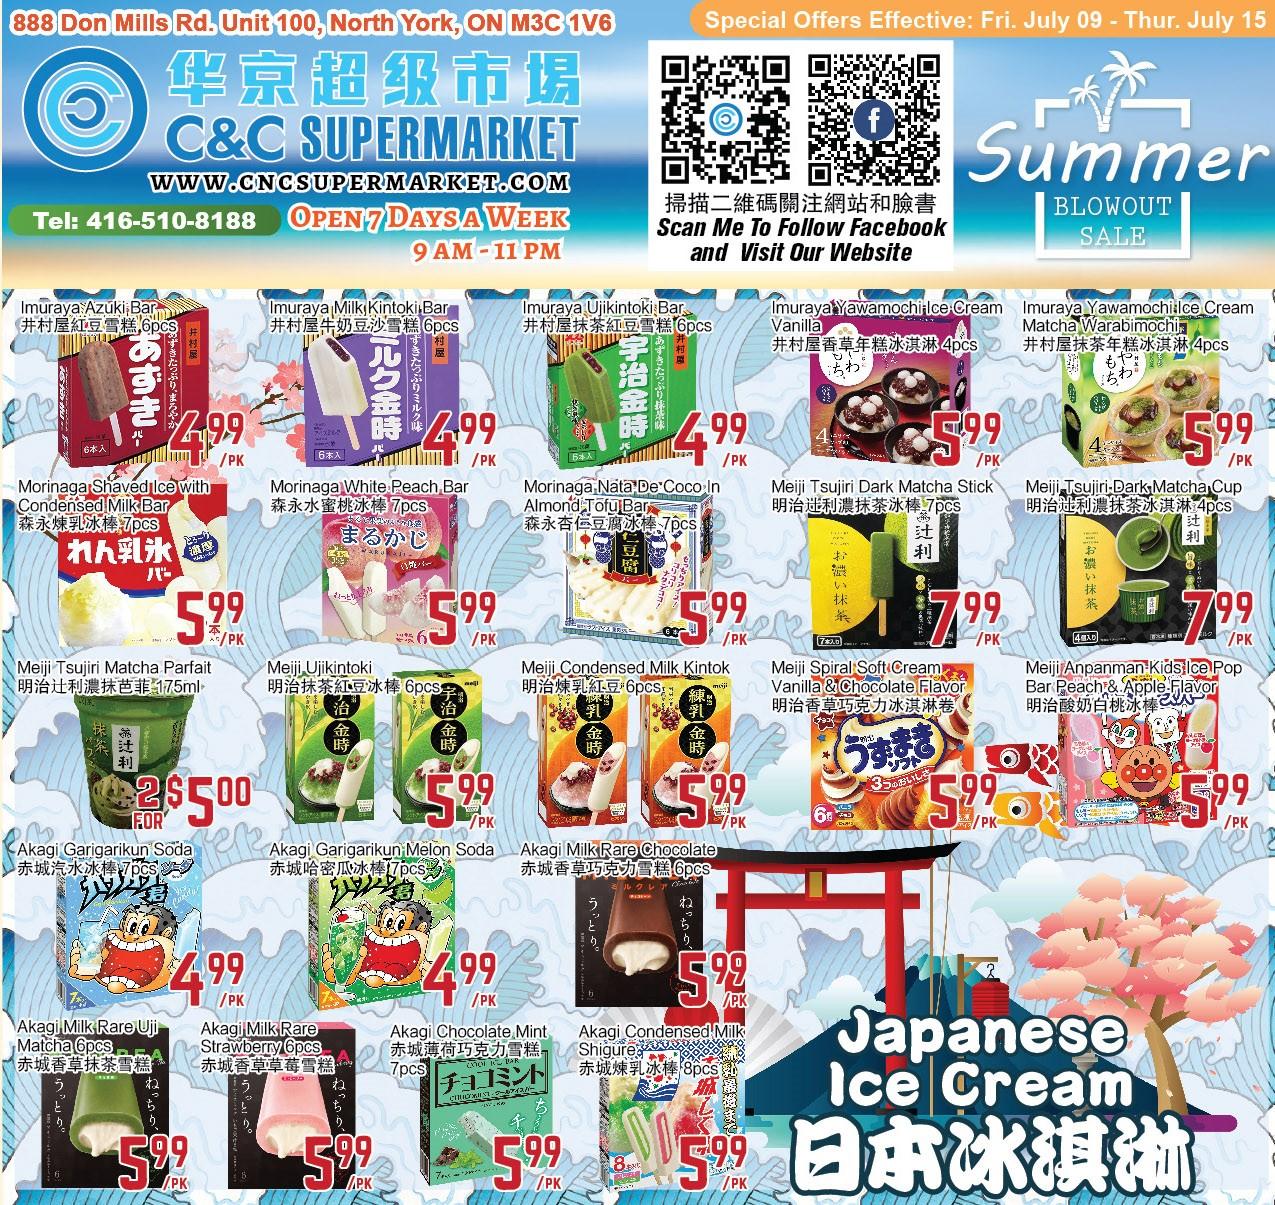 C&C Supermarket Flyer | Jul 9